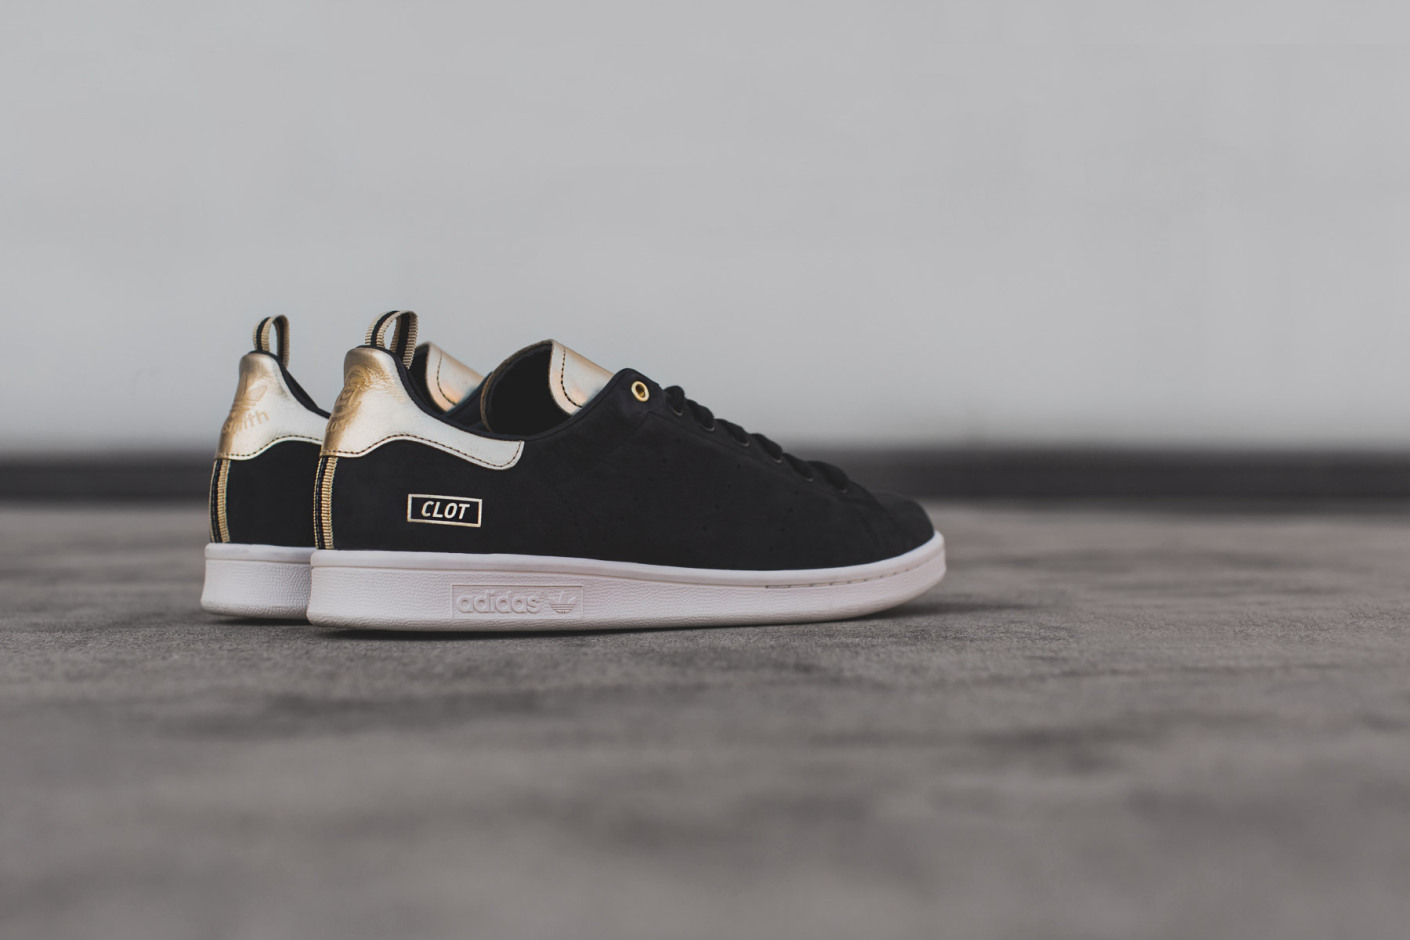 Adidas Stan Smith Update - Black / White